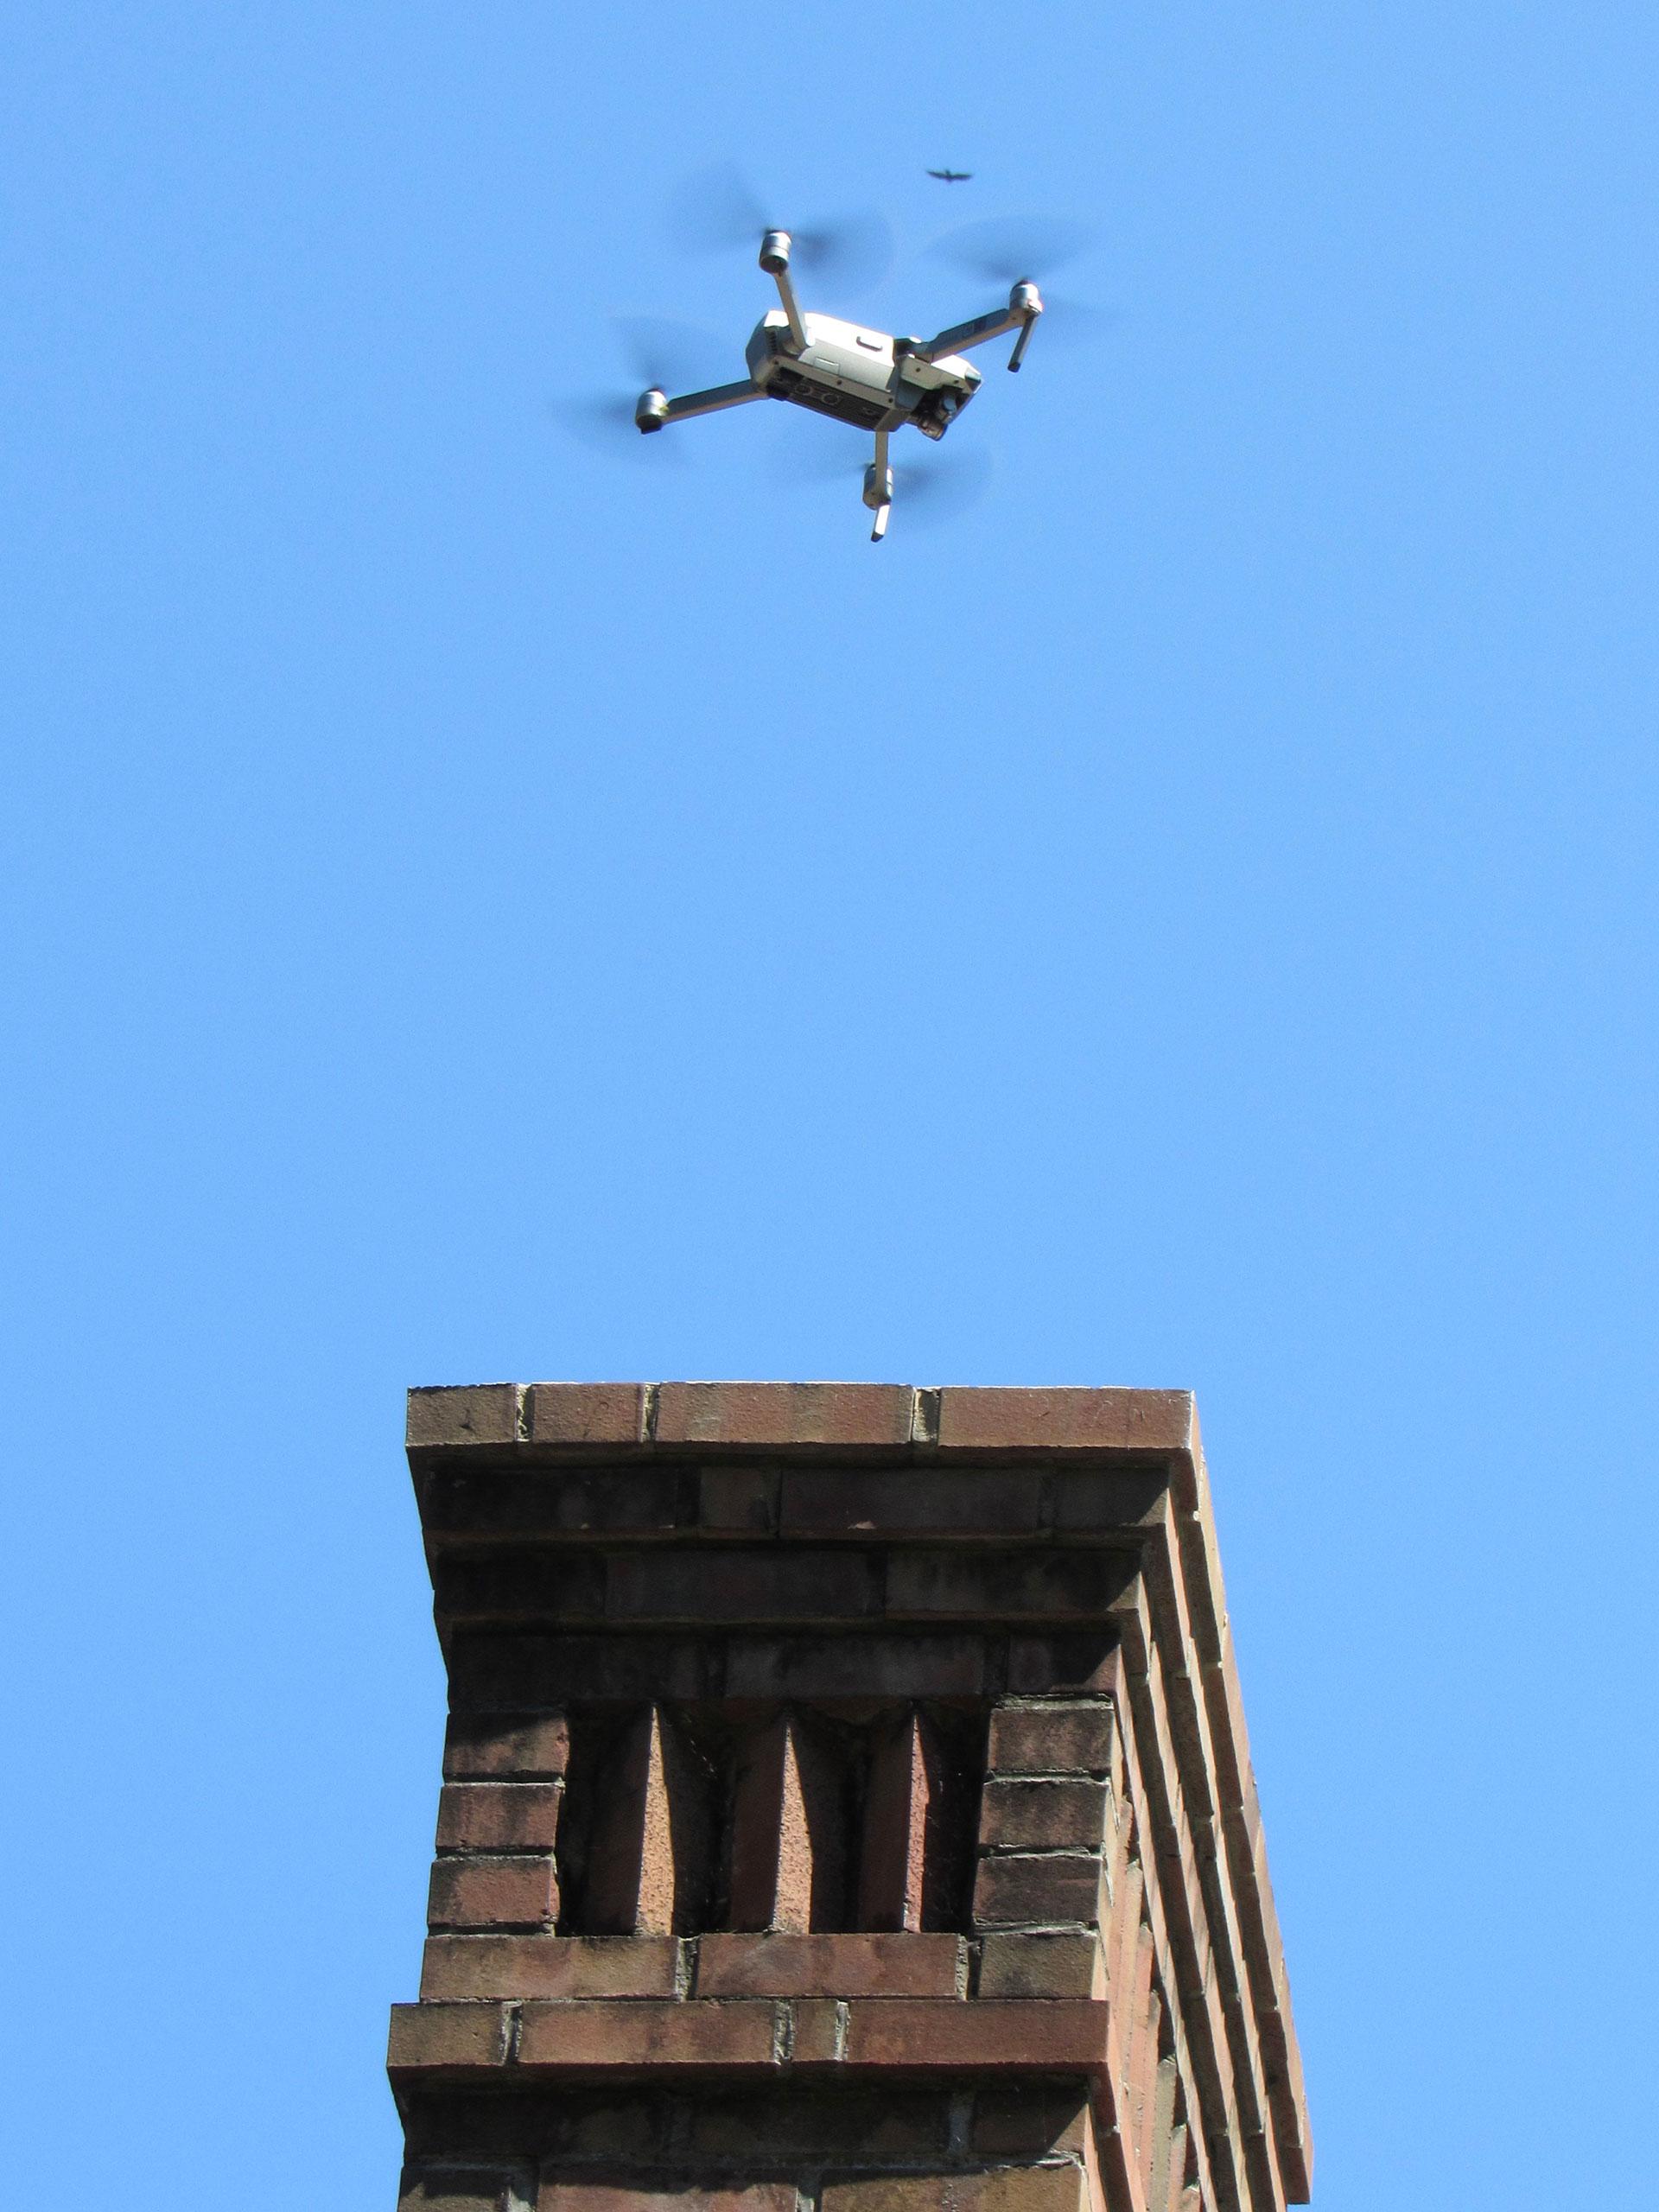 Drone Overhead